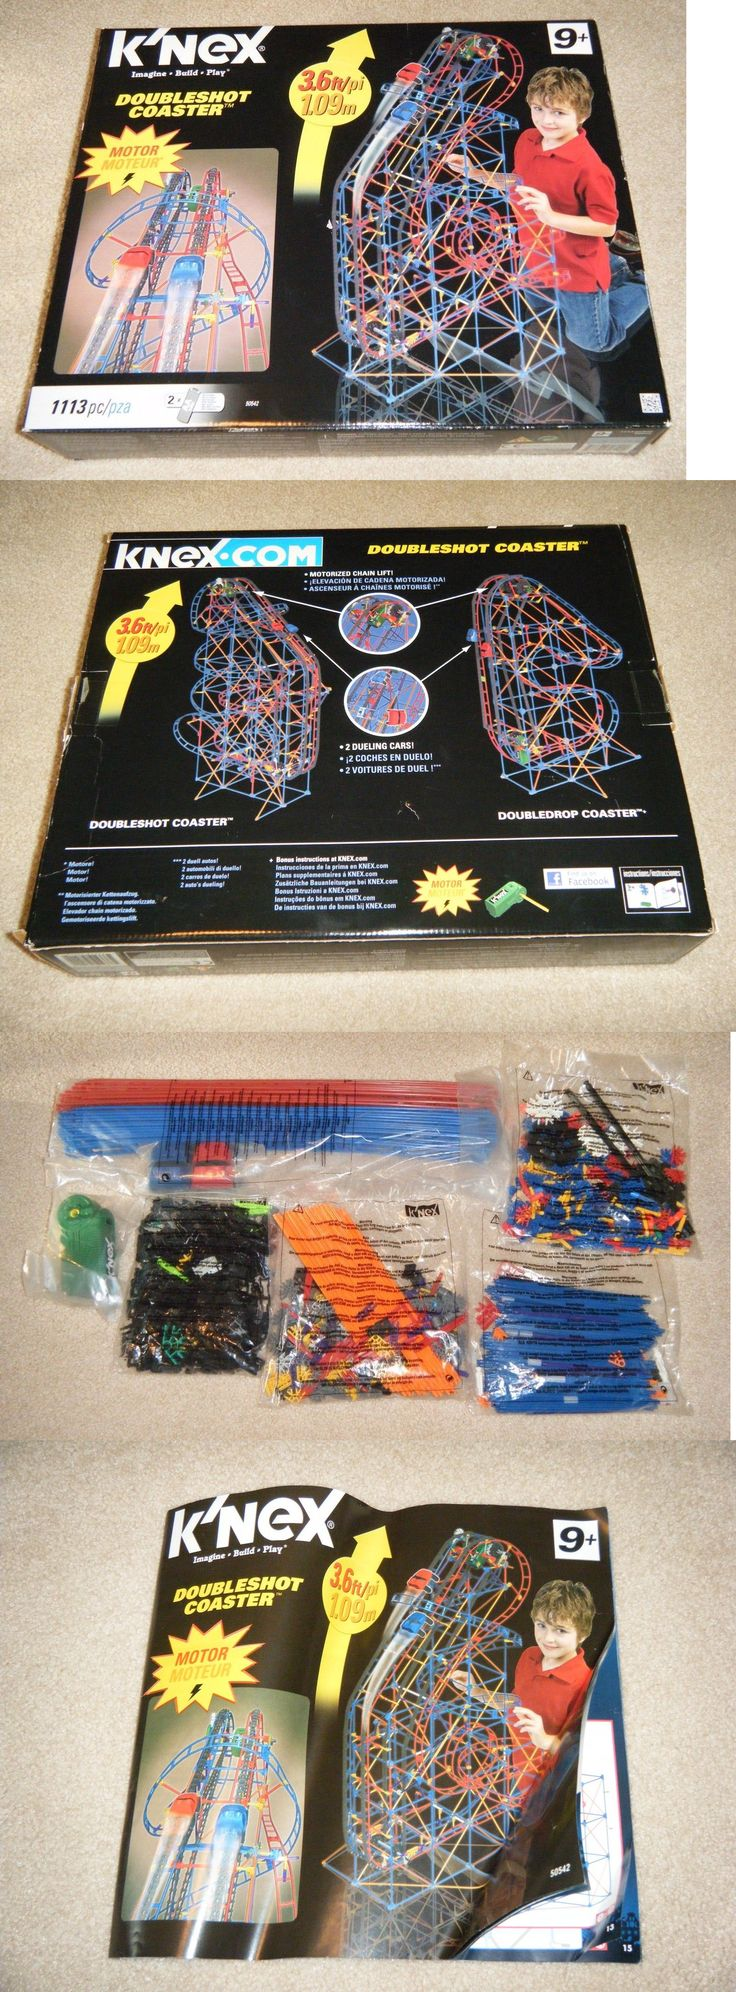 KNEX 21254: New - Open Box K Nex Doubleshot Roller Coaster Theme Park Ride Knex 3Ft Motor -> BUY IT NOW ONLY: $60 on eBay!